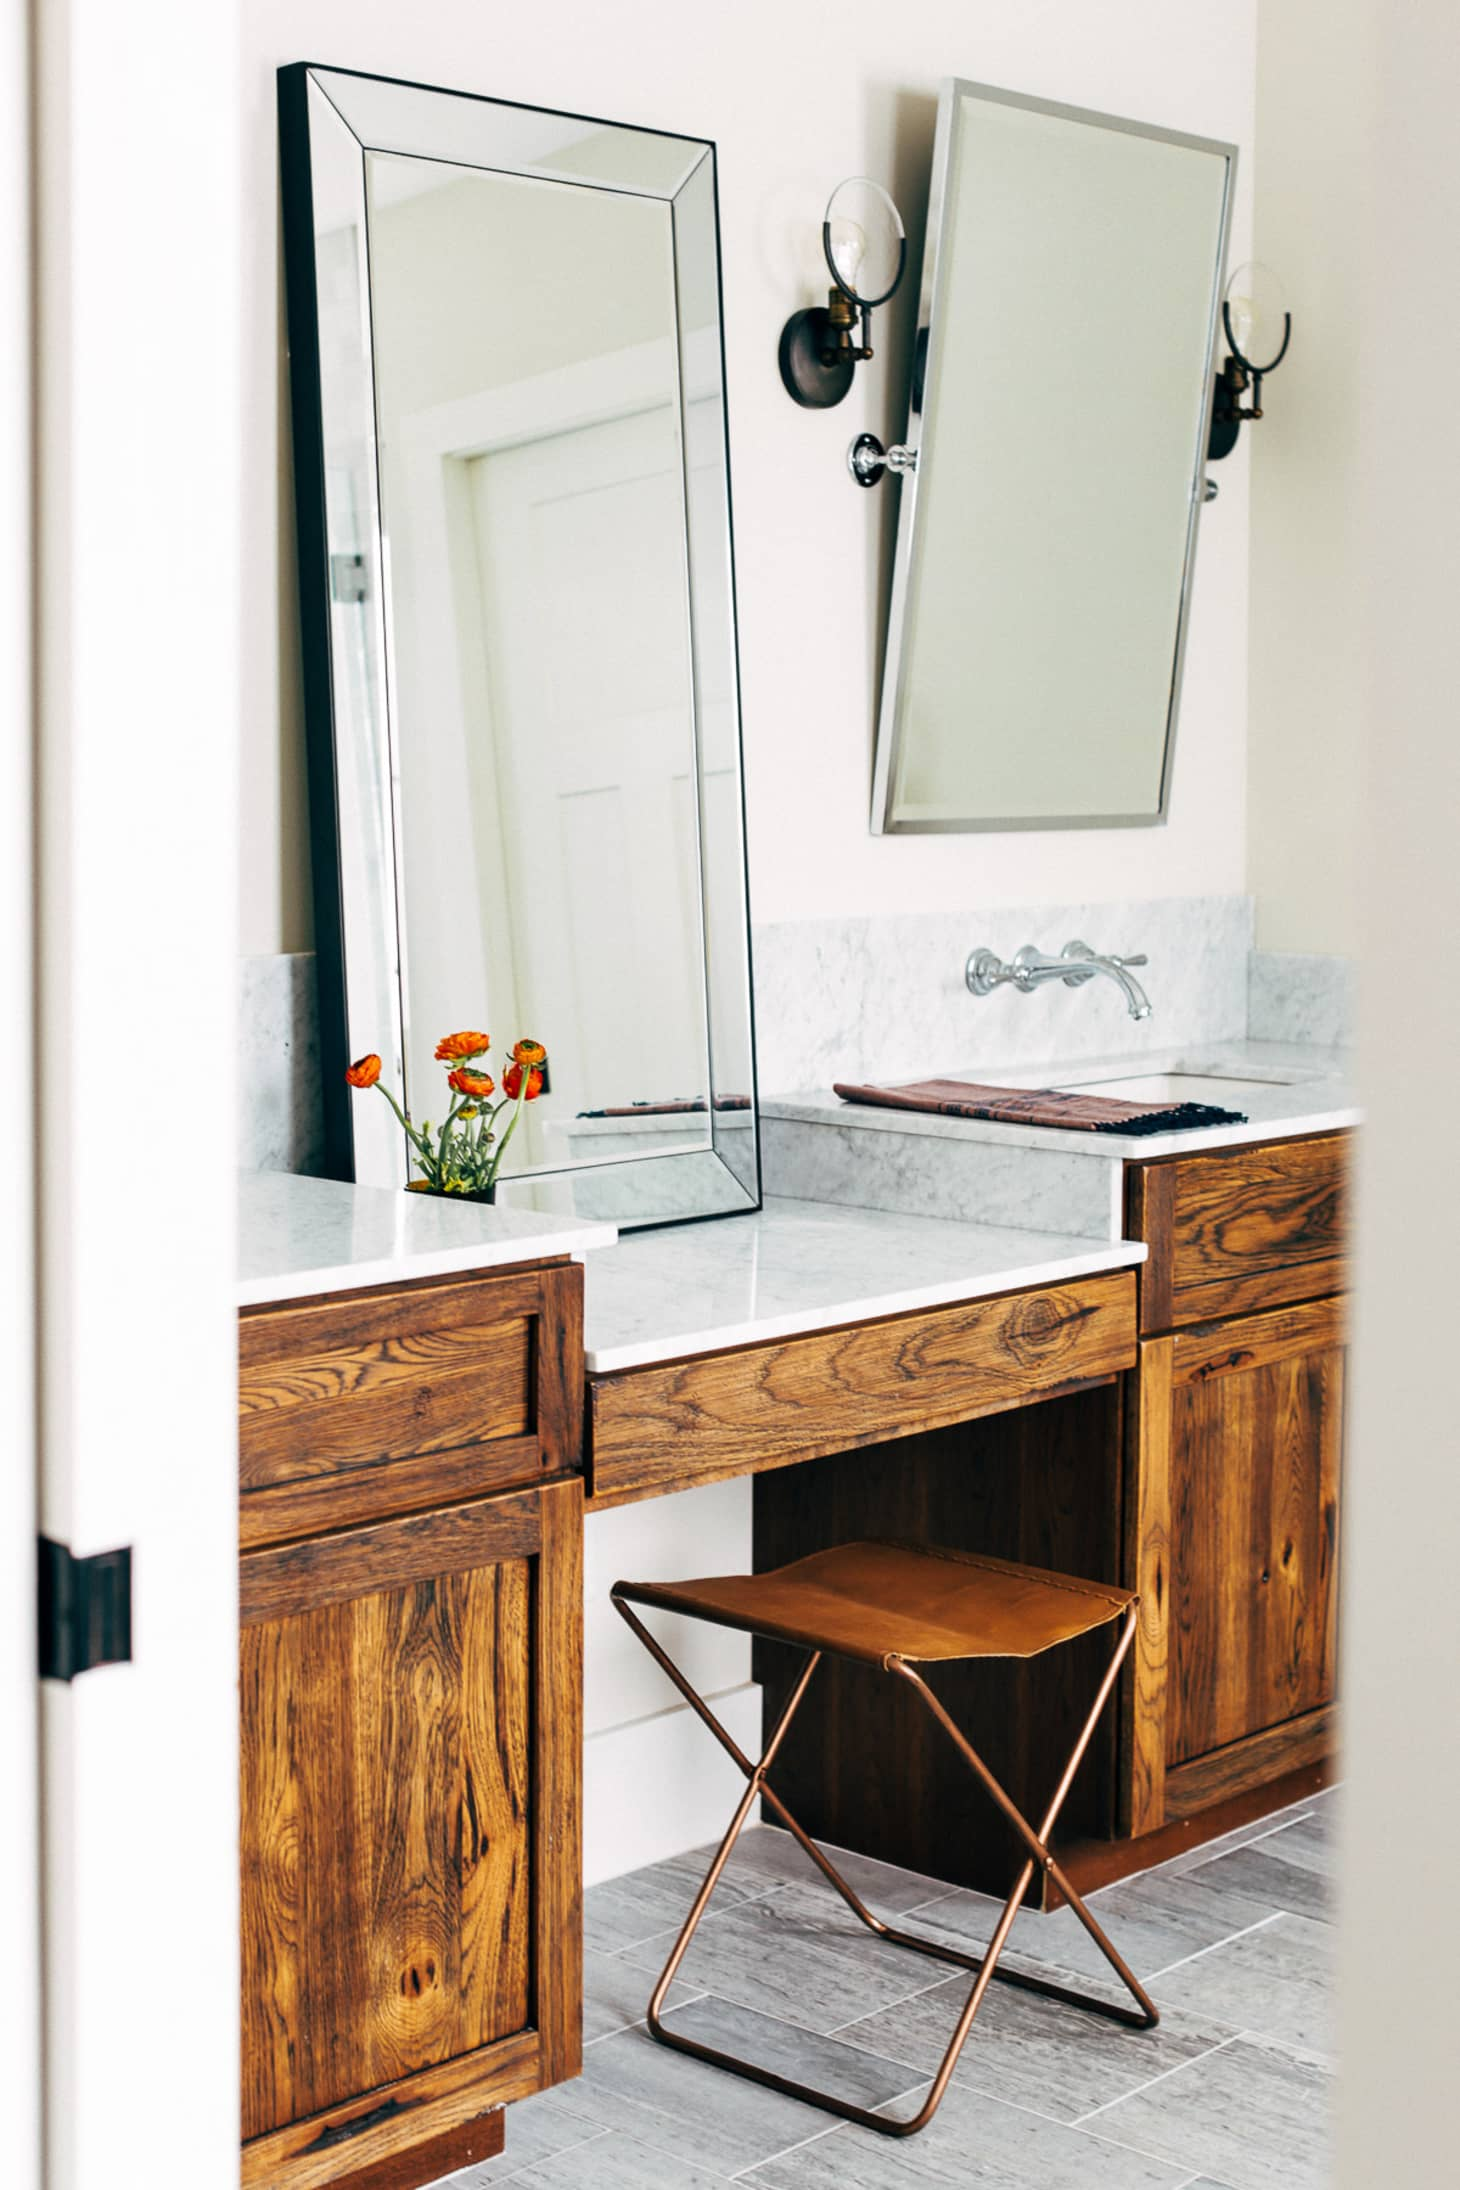 Bathroom Vanity Extended Over Toilet: Bathroom Vanity Ideas That Add A Little Luxury